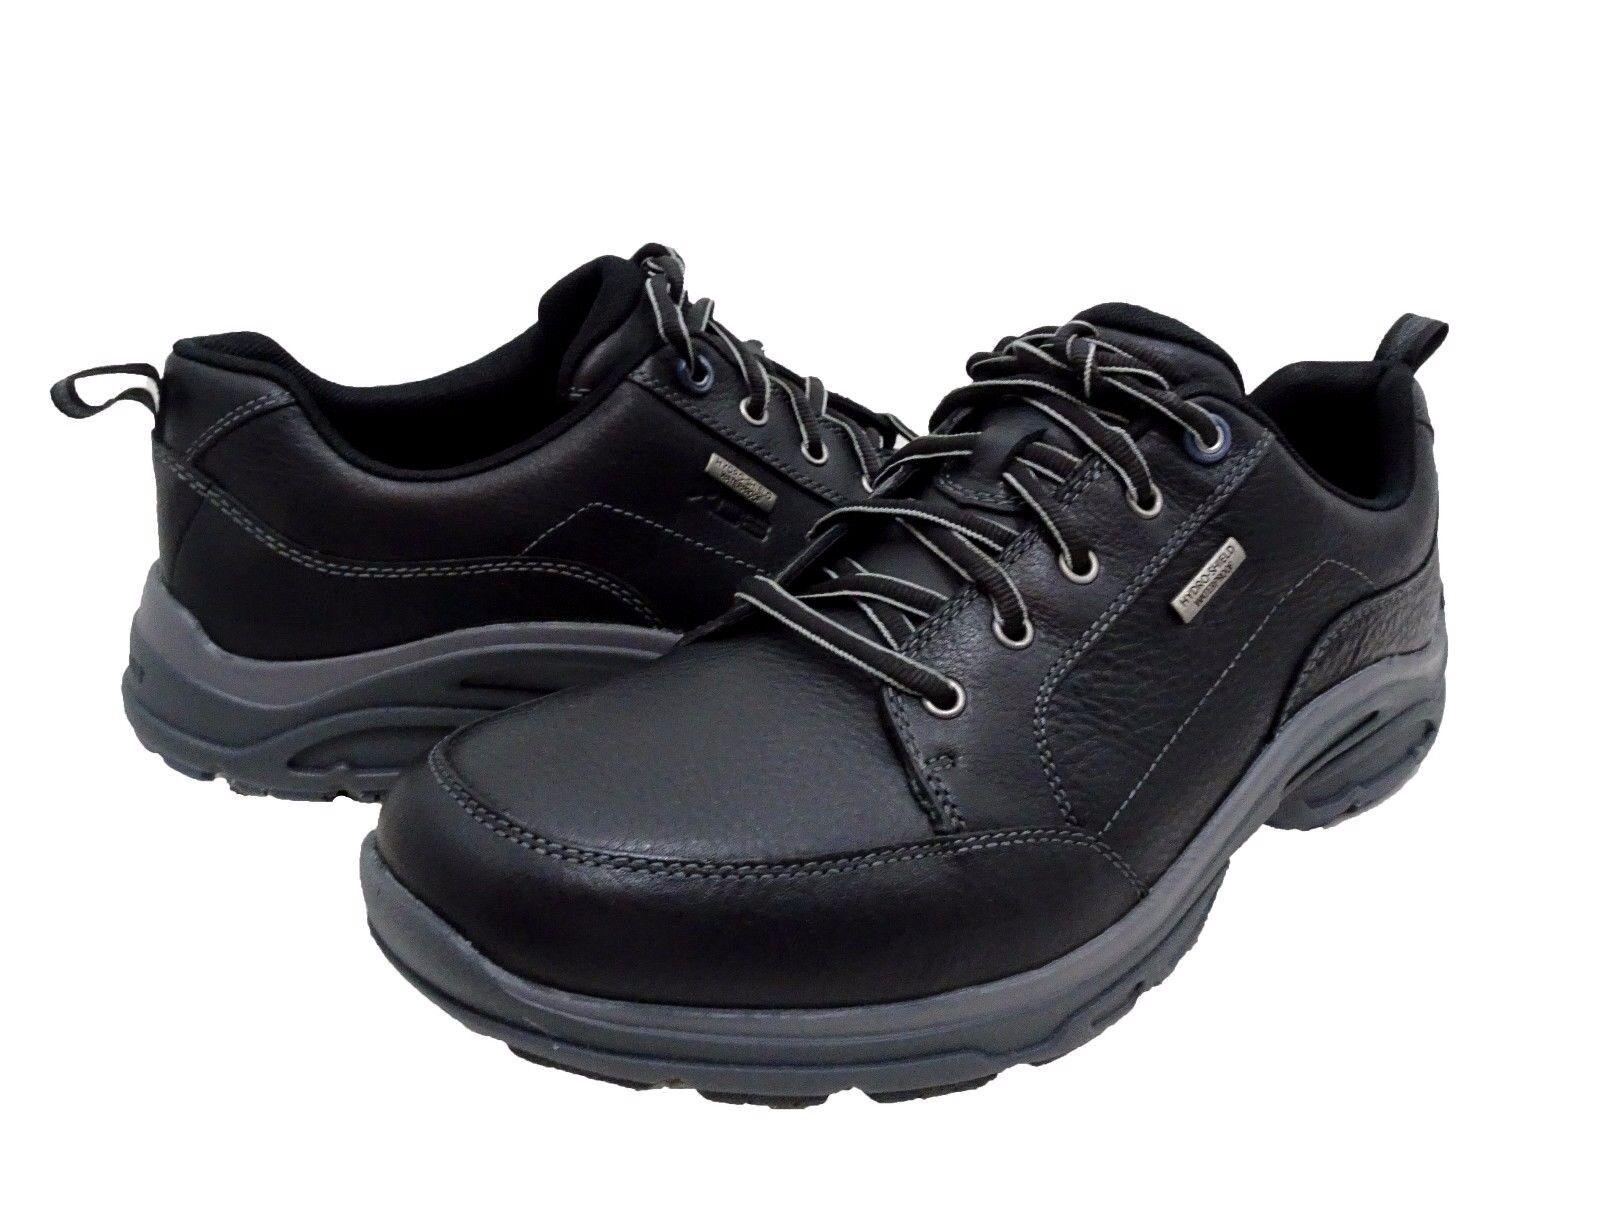 Rockport Uomo Weather Adventure Blucher Lace Up Waterproof  Kicks Shoes